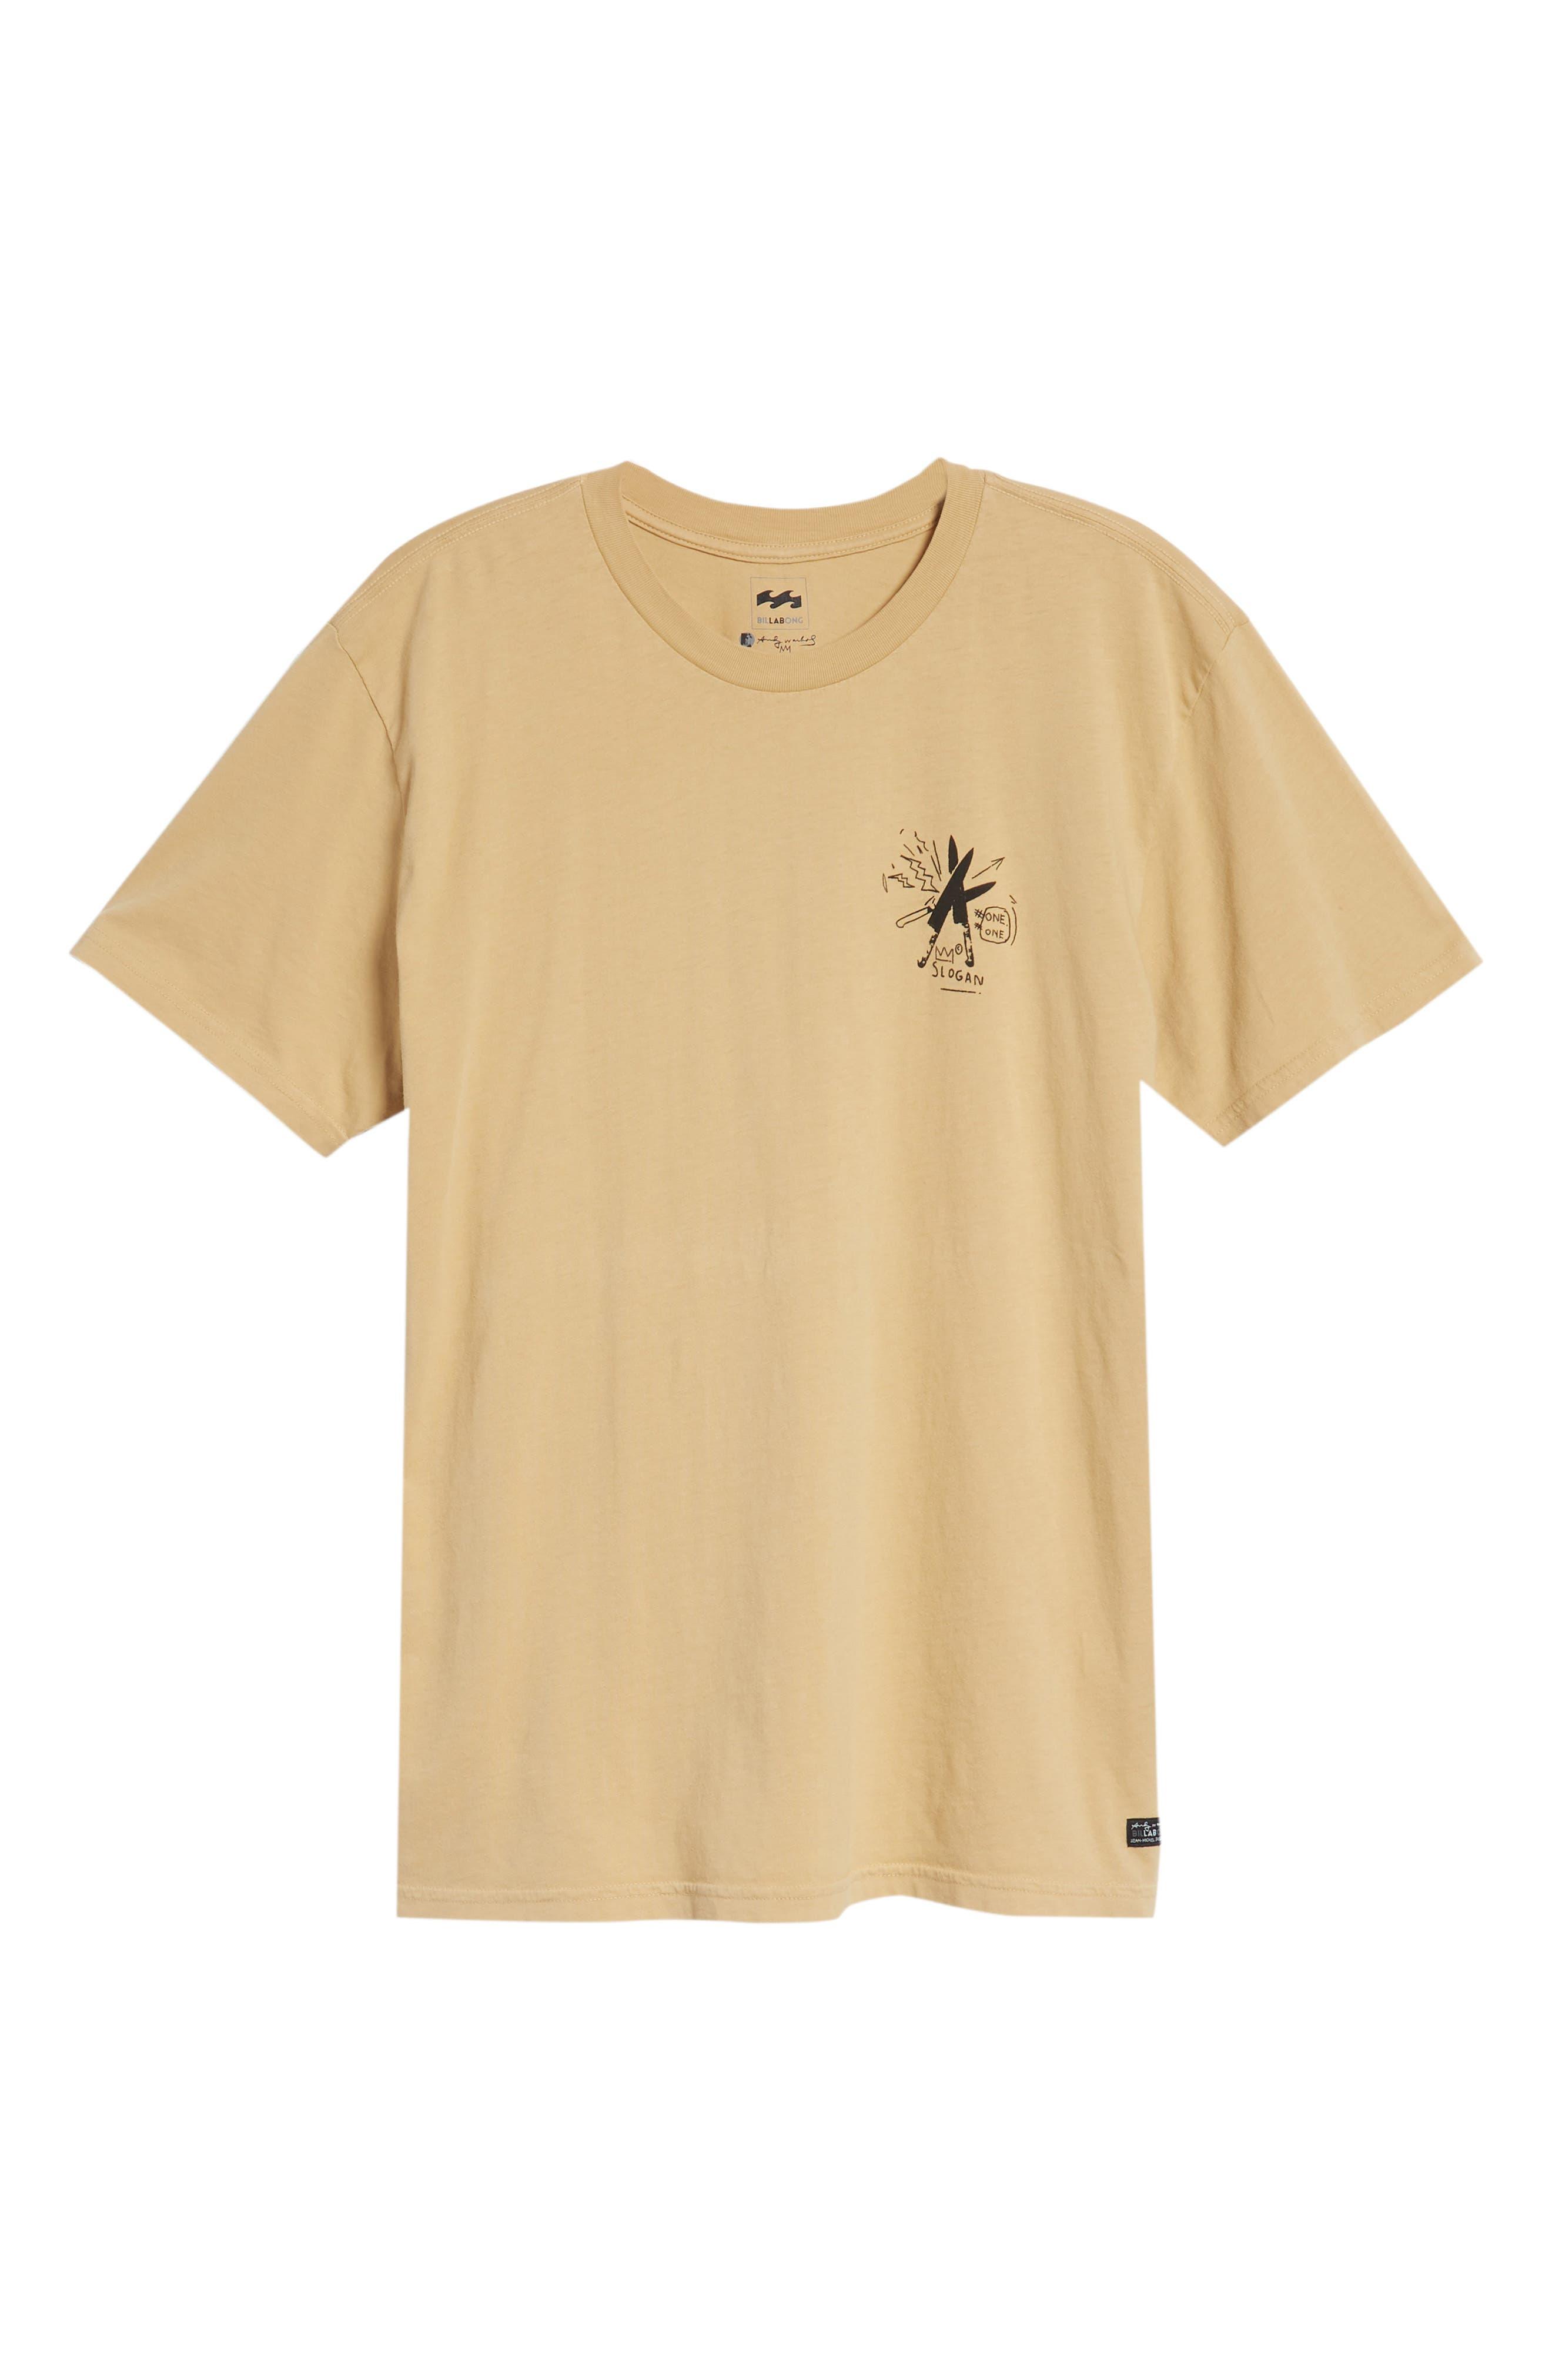 x Warhol Slogan T-Shirt,                             Alternate thumbnail 6, color,                             250